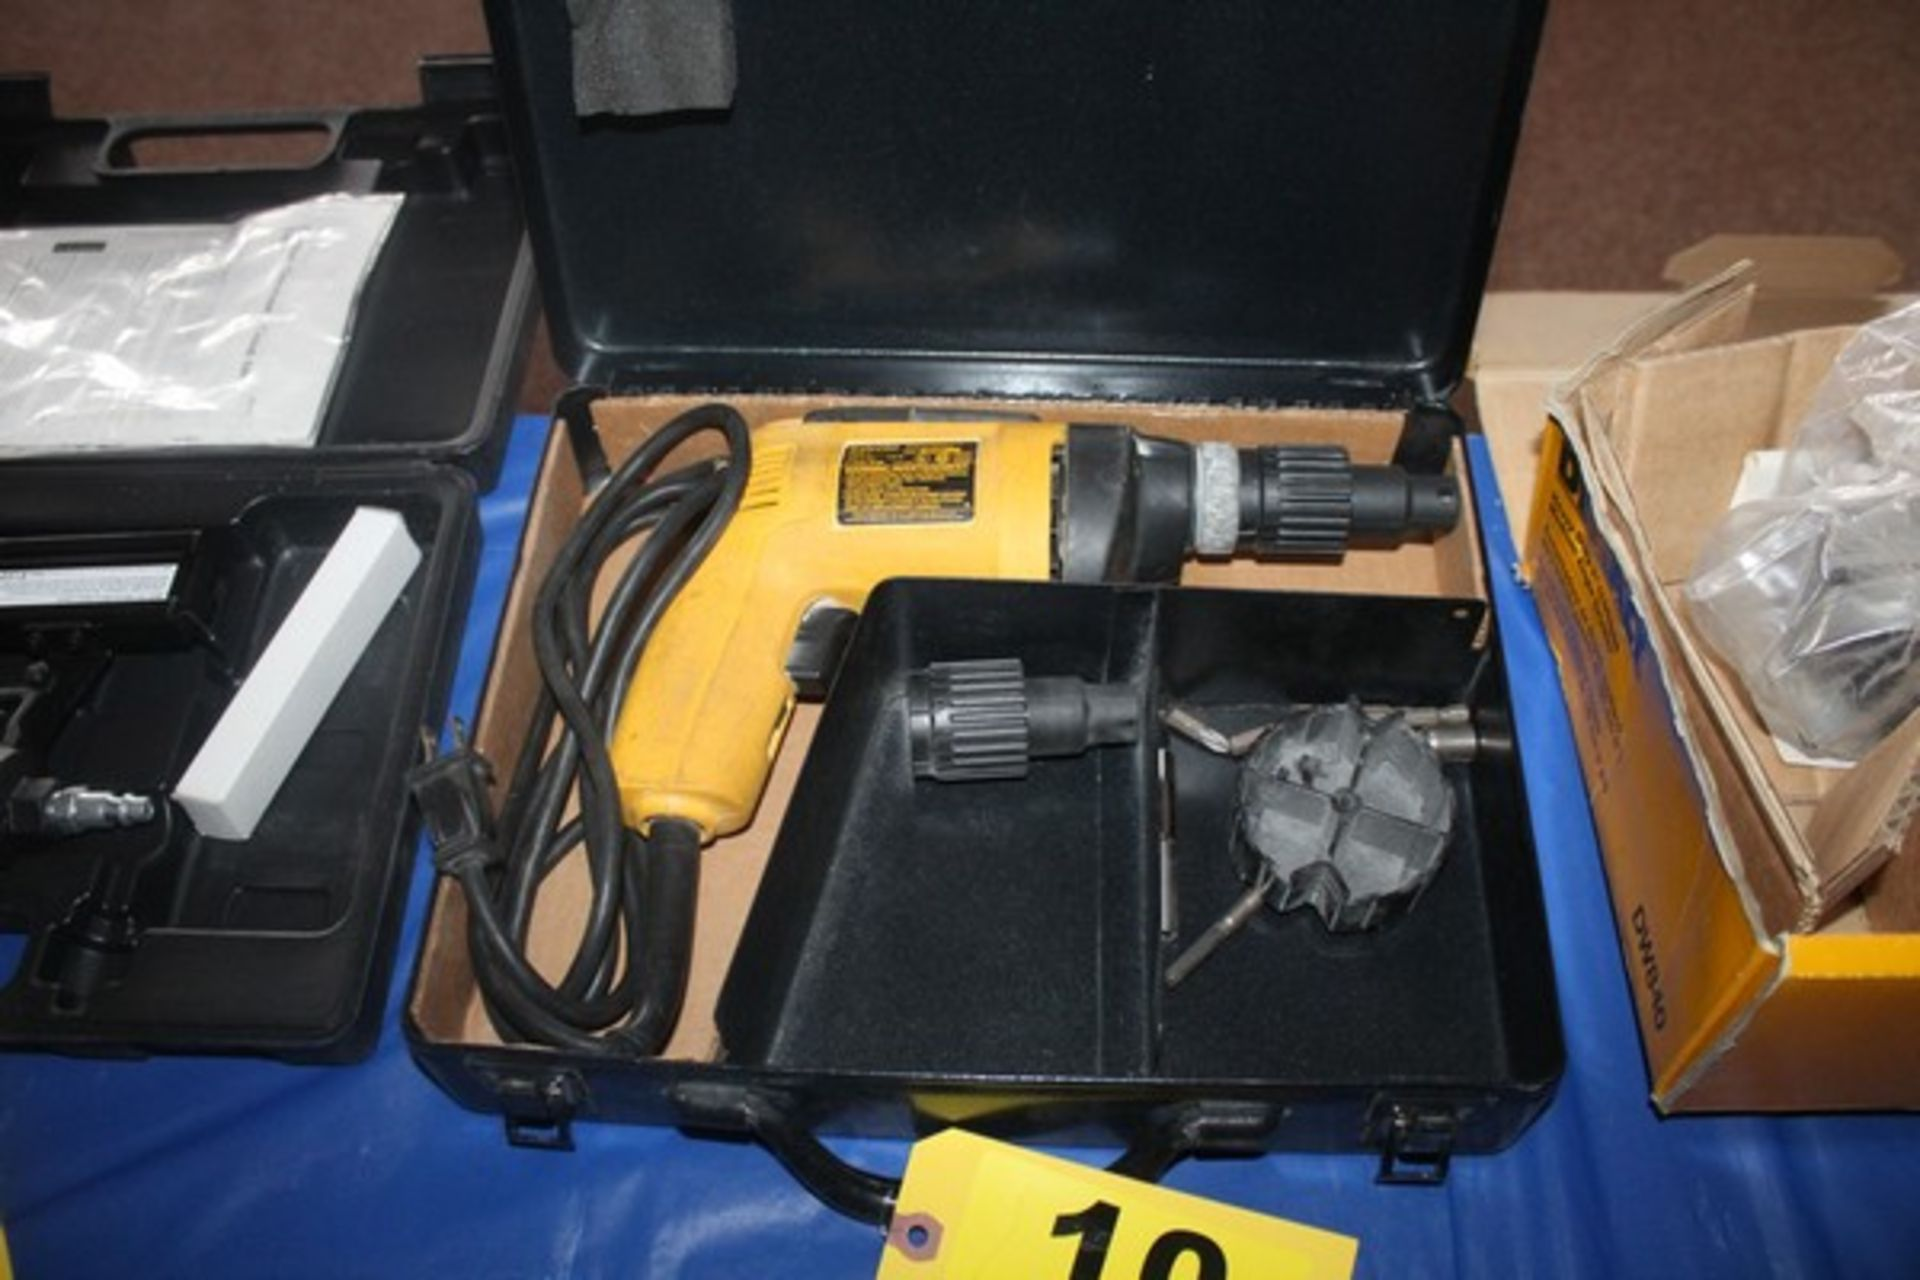 DEWALT MODEL DW280 DEPTH SENSITIVE SCREW DRIVER WITH CASE